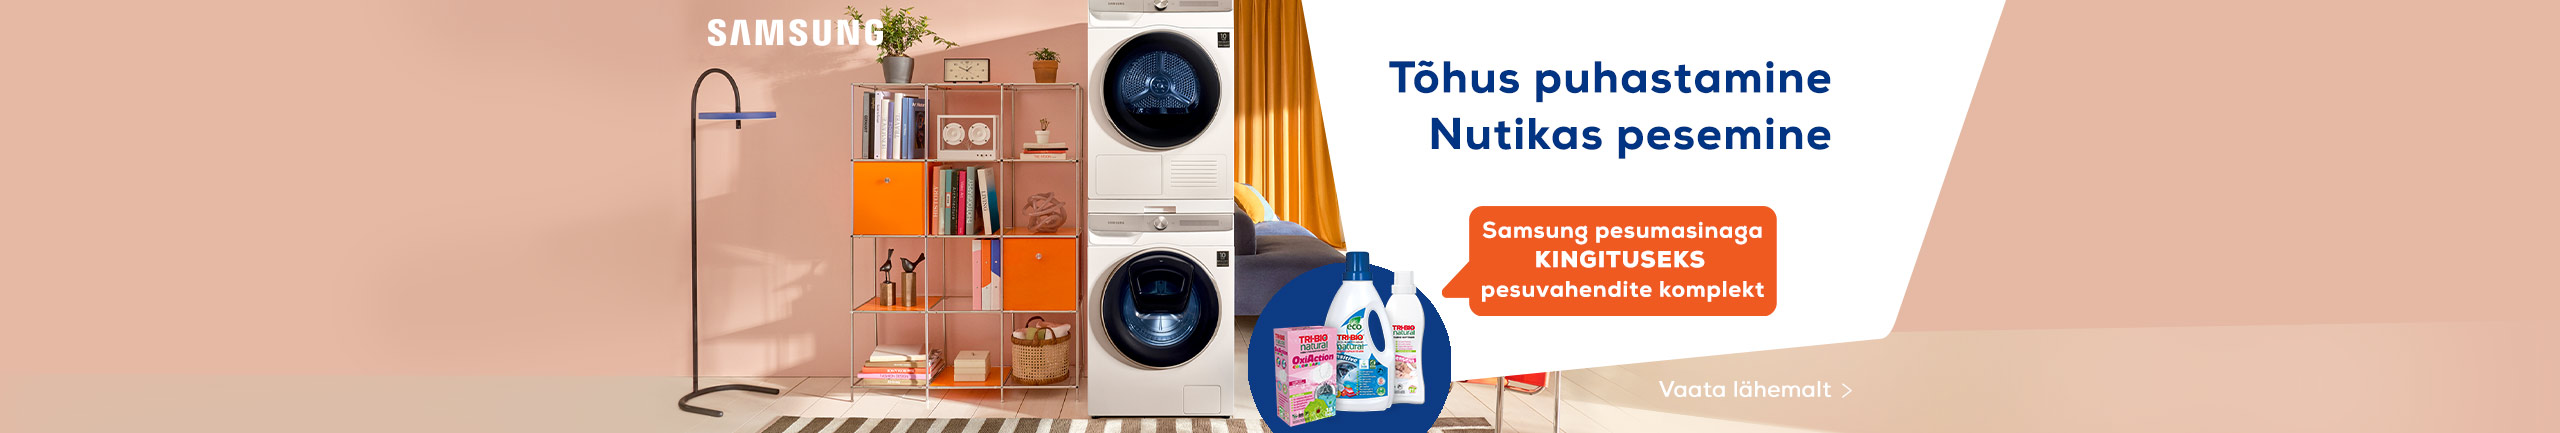 Samsung pesumasinaga kingituseks pesuvahendite komplekt